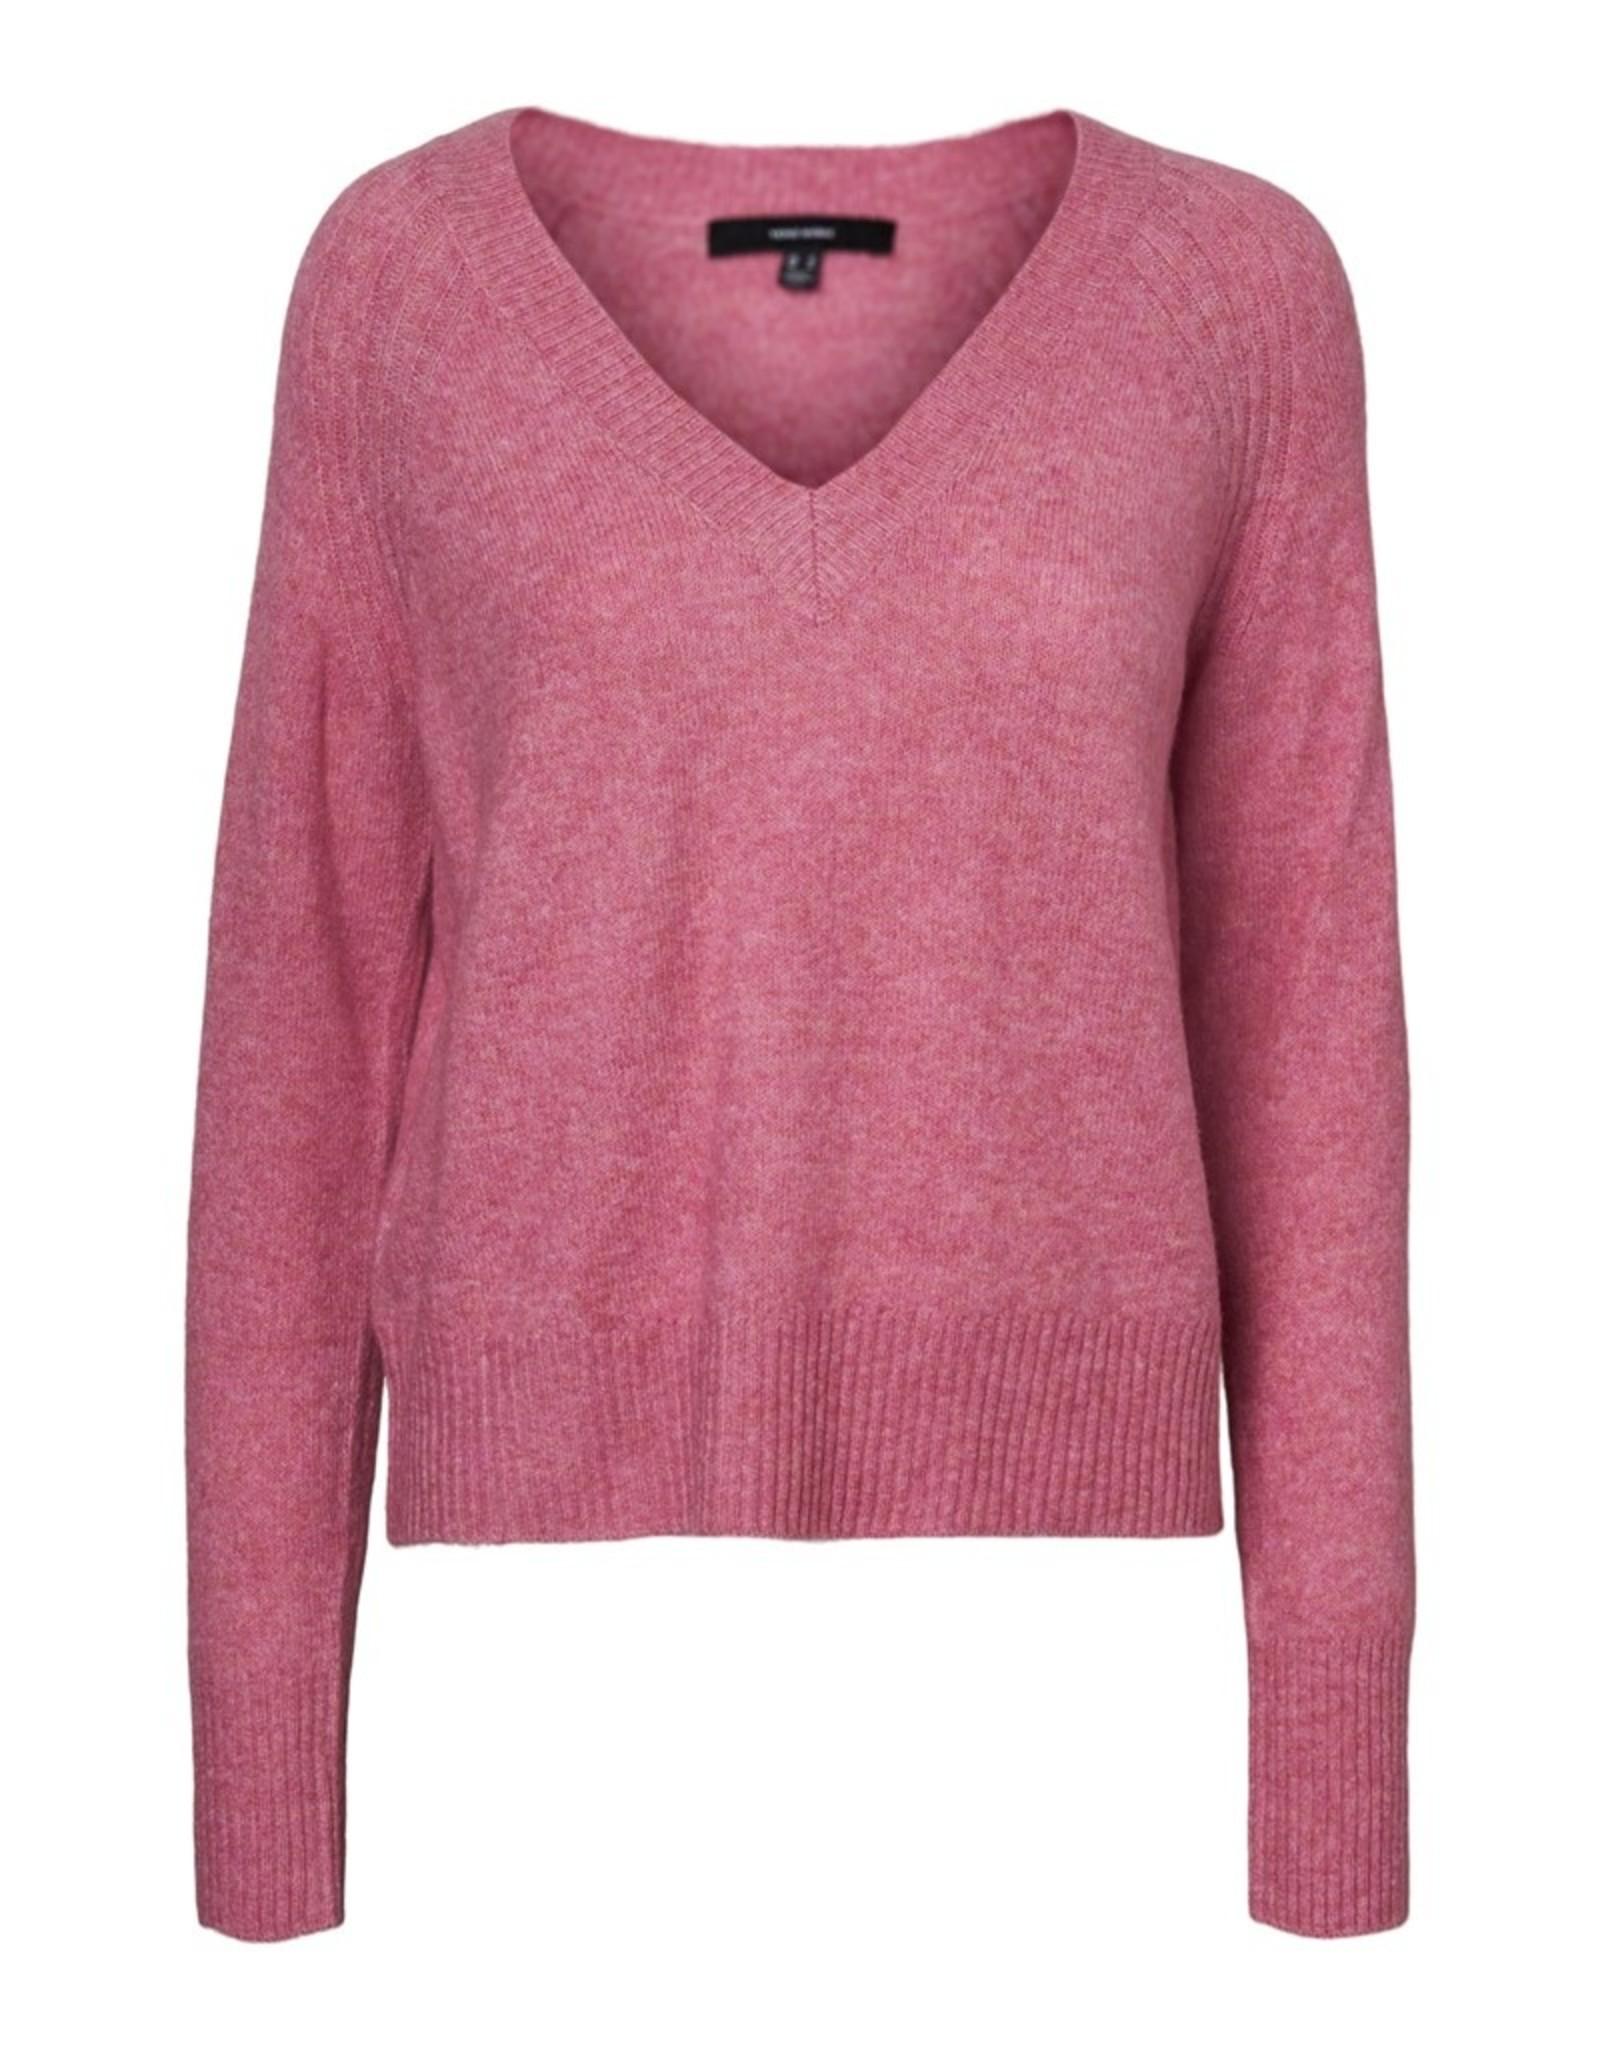 Vero Moda Wind Sweater